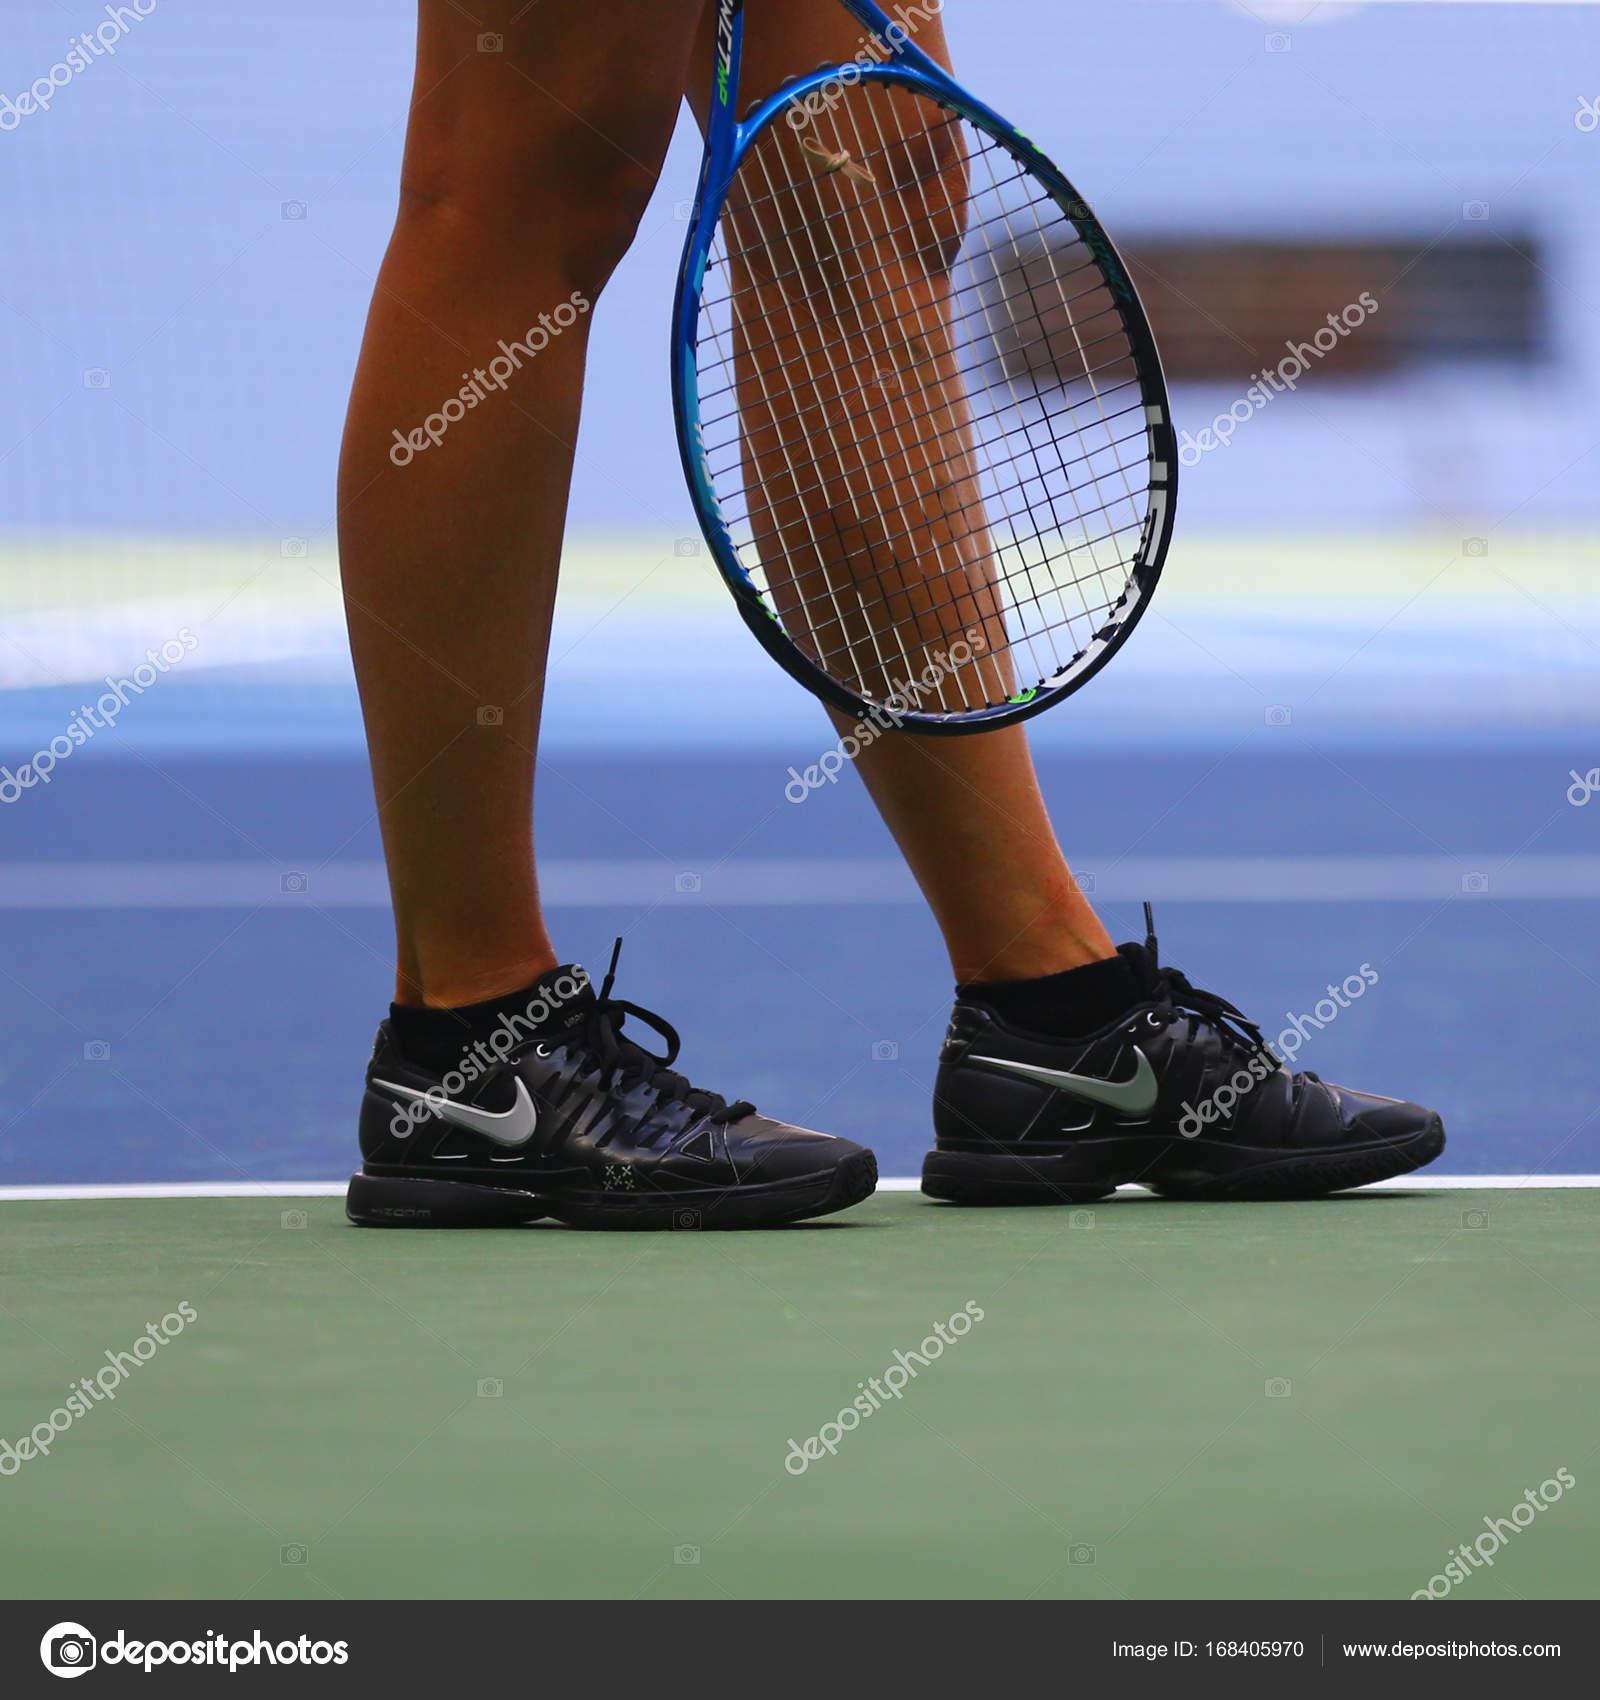 Five times Grand Slam Champion Maria